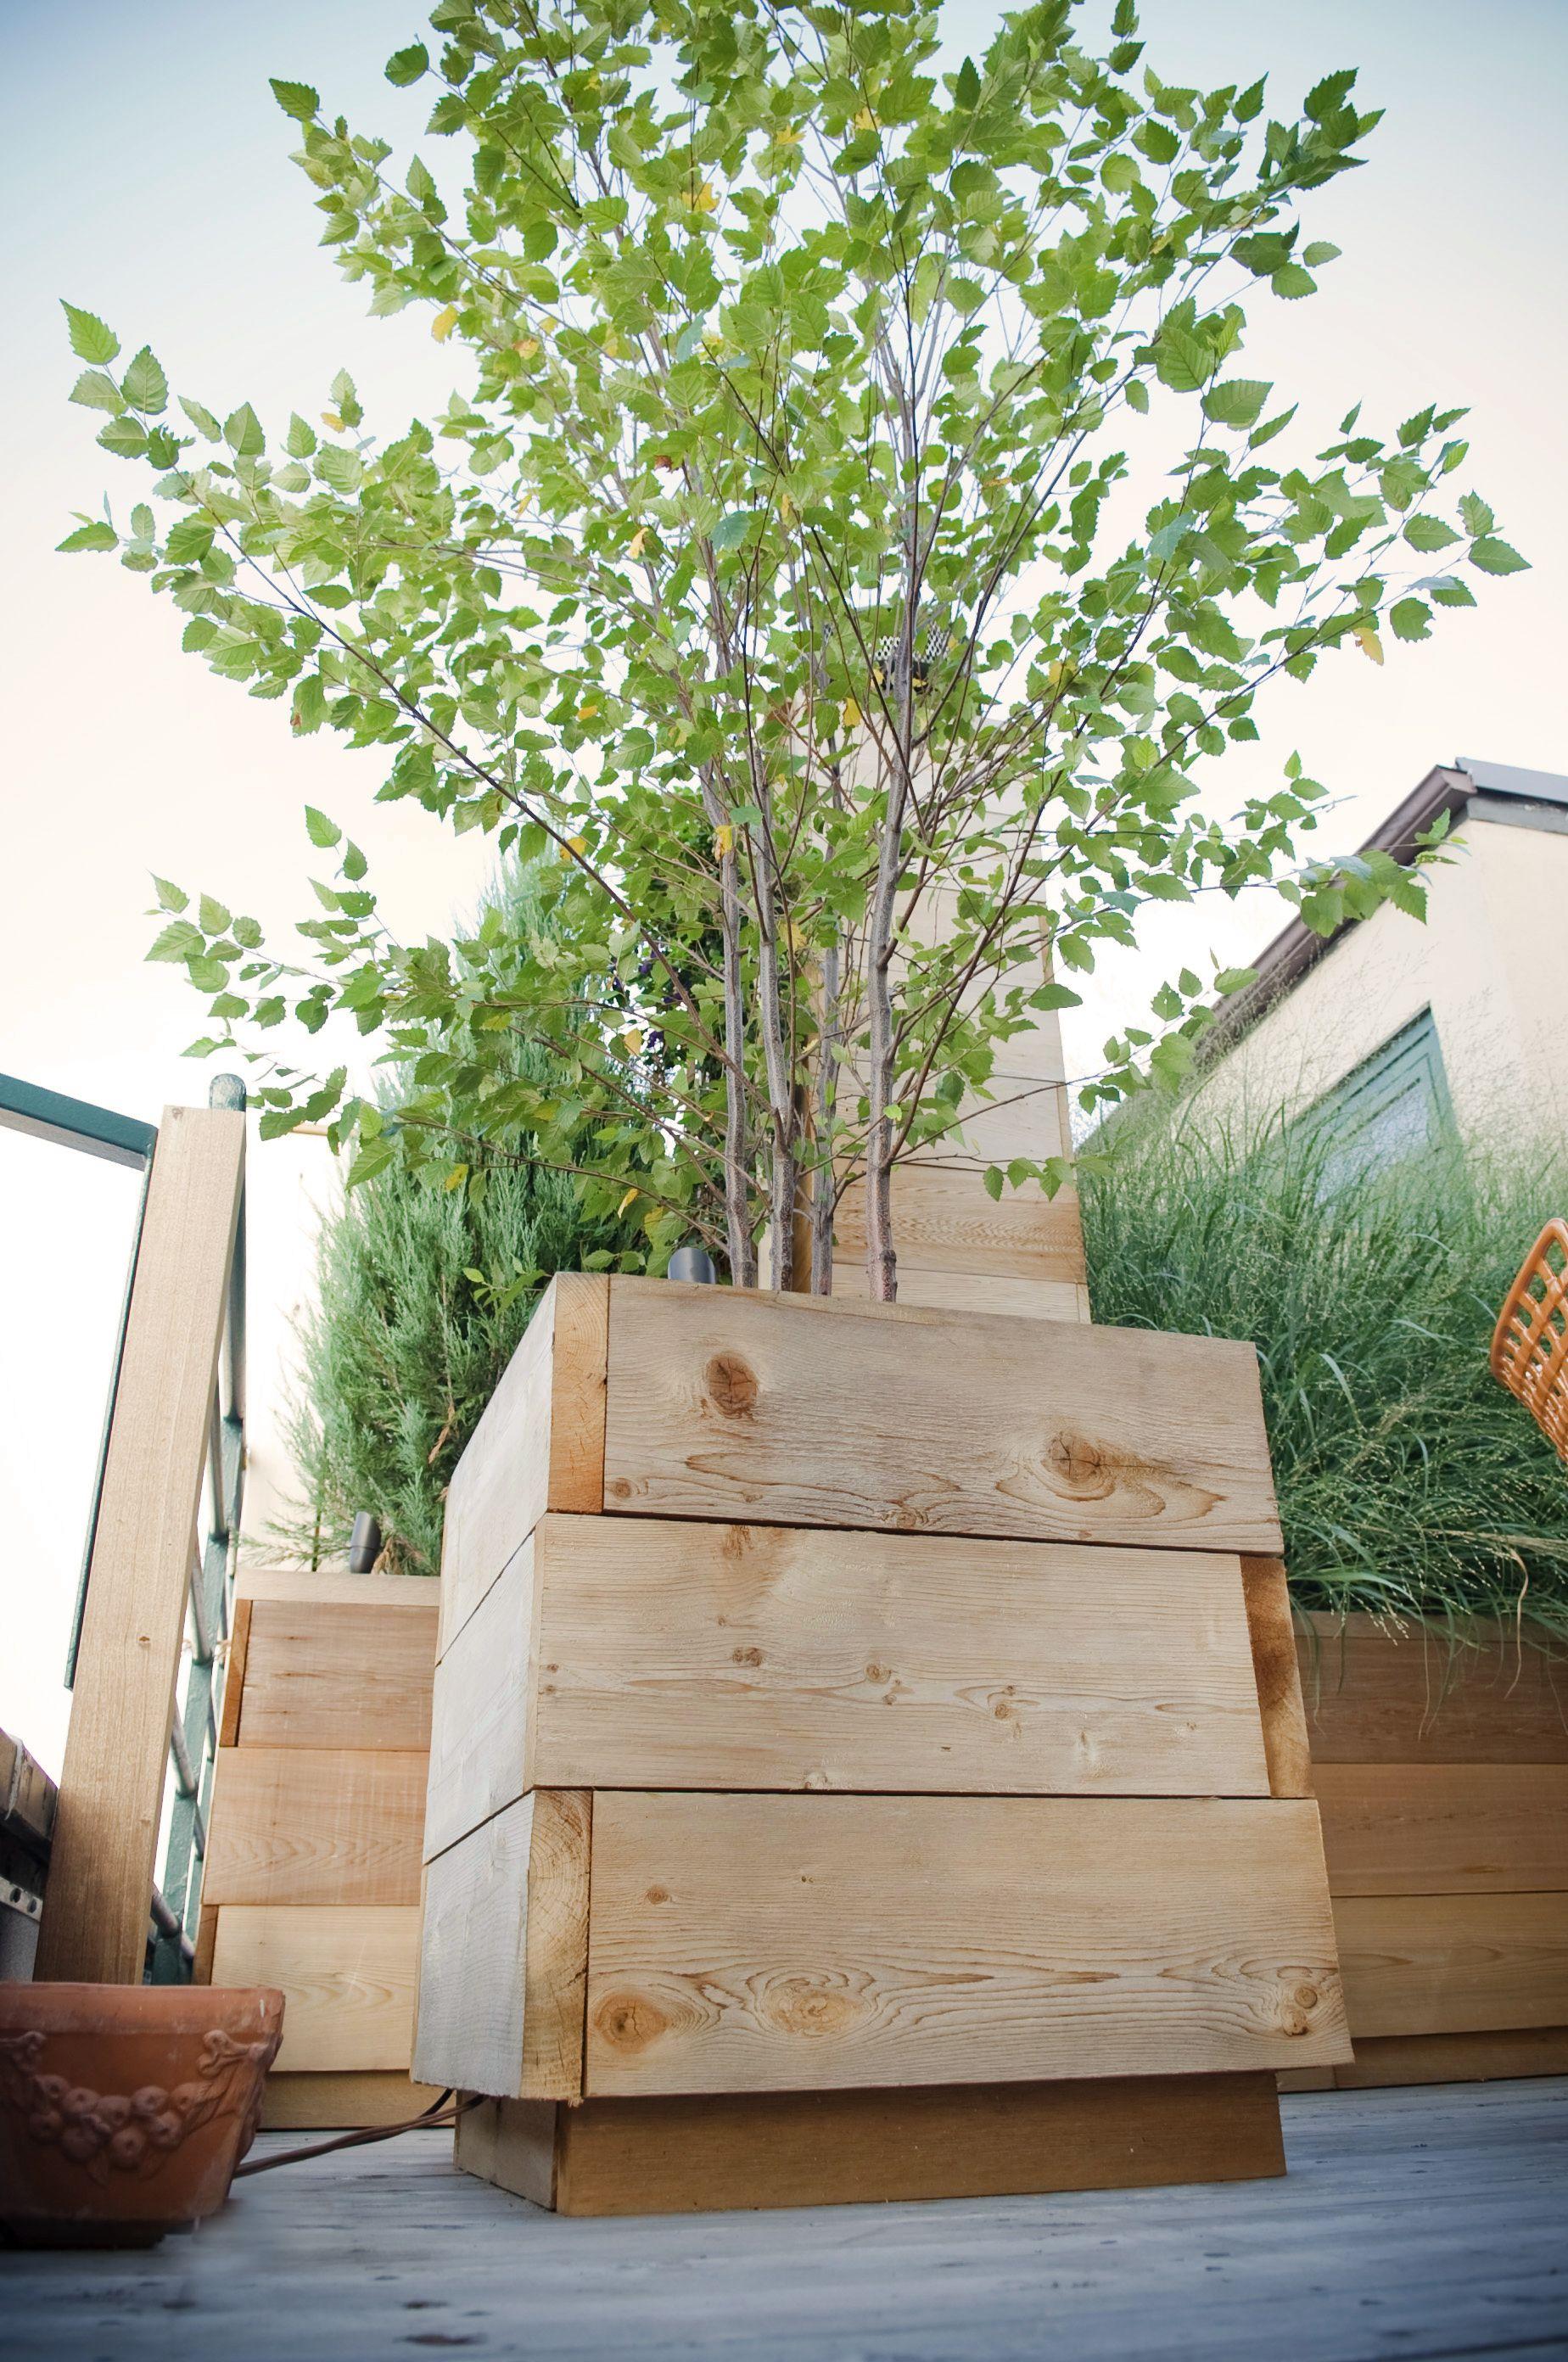 Roof Deck Planters Outdoor Furniture Birch Trees Urban